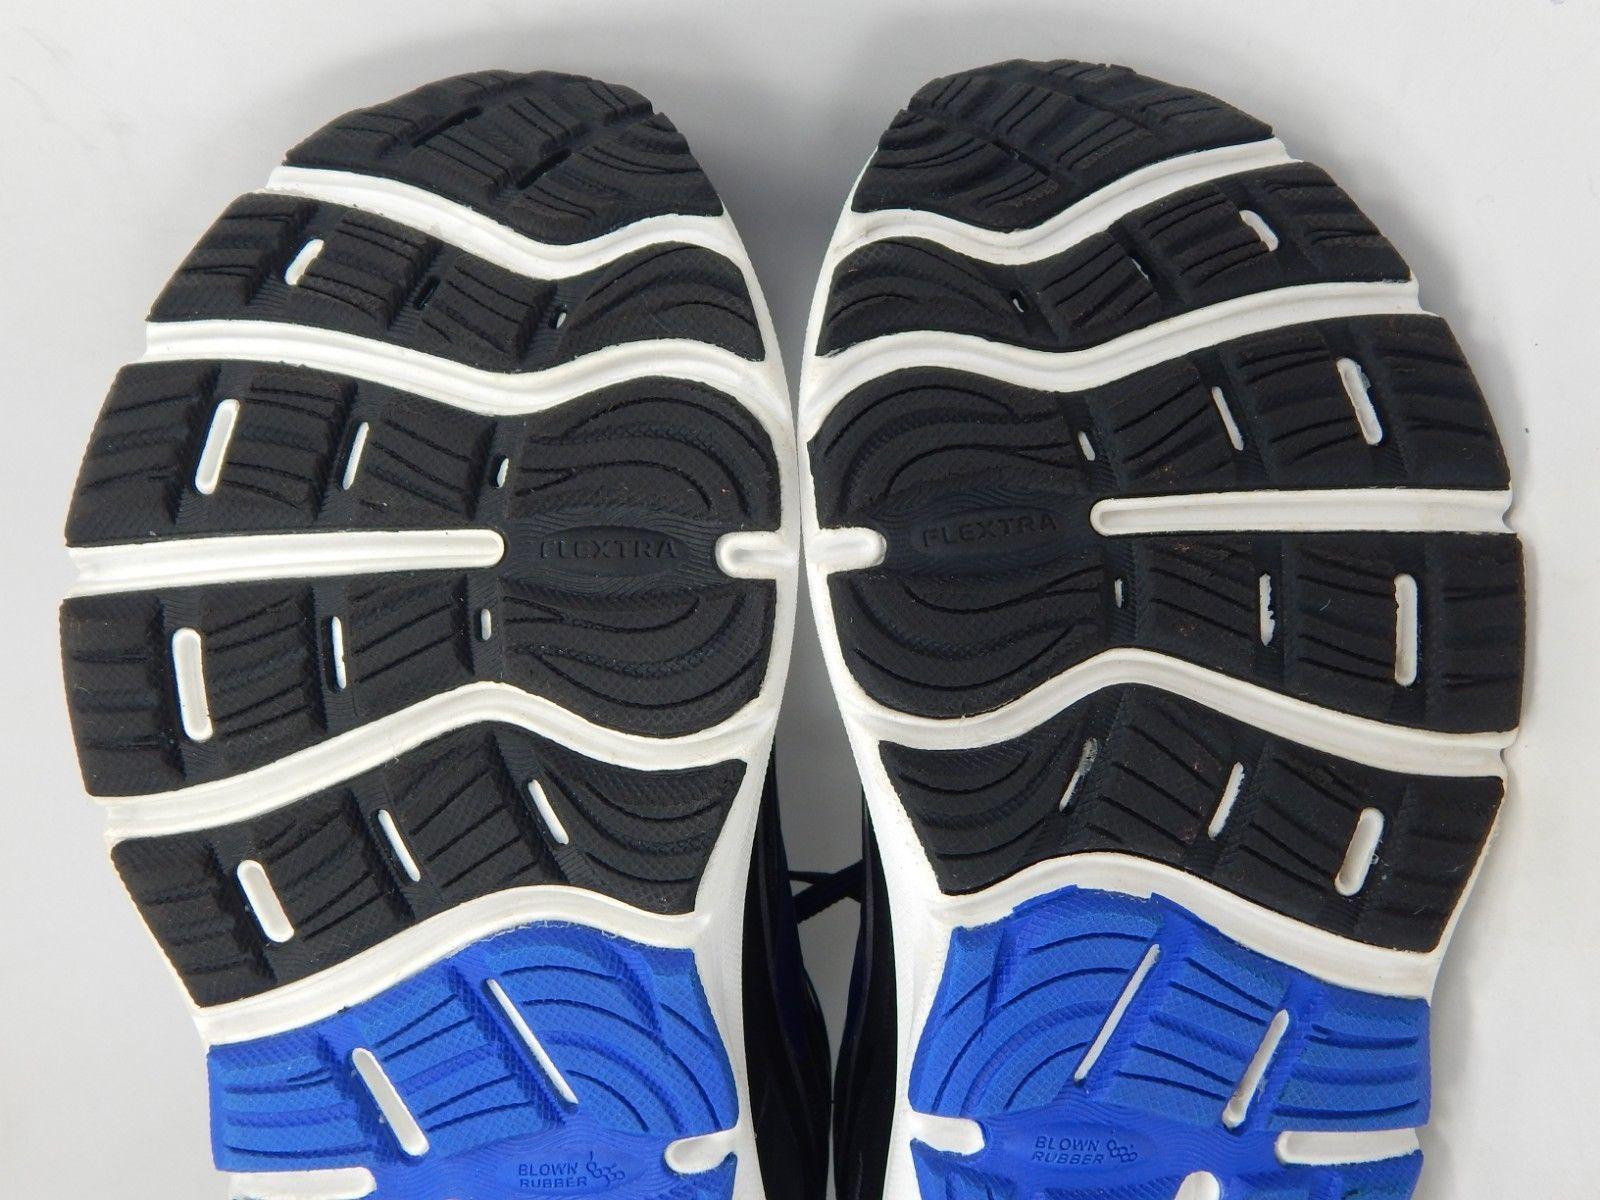 Brooks Transcend 4 Size US 10 M (D) EU 44 Men's Running Shoes Black 1102491D002 image 7